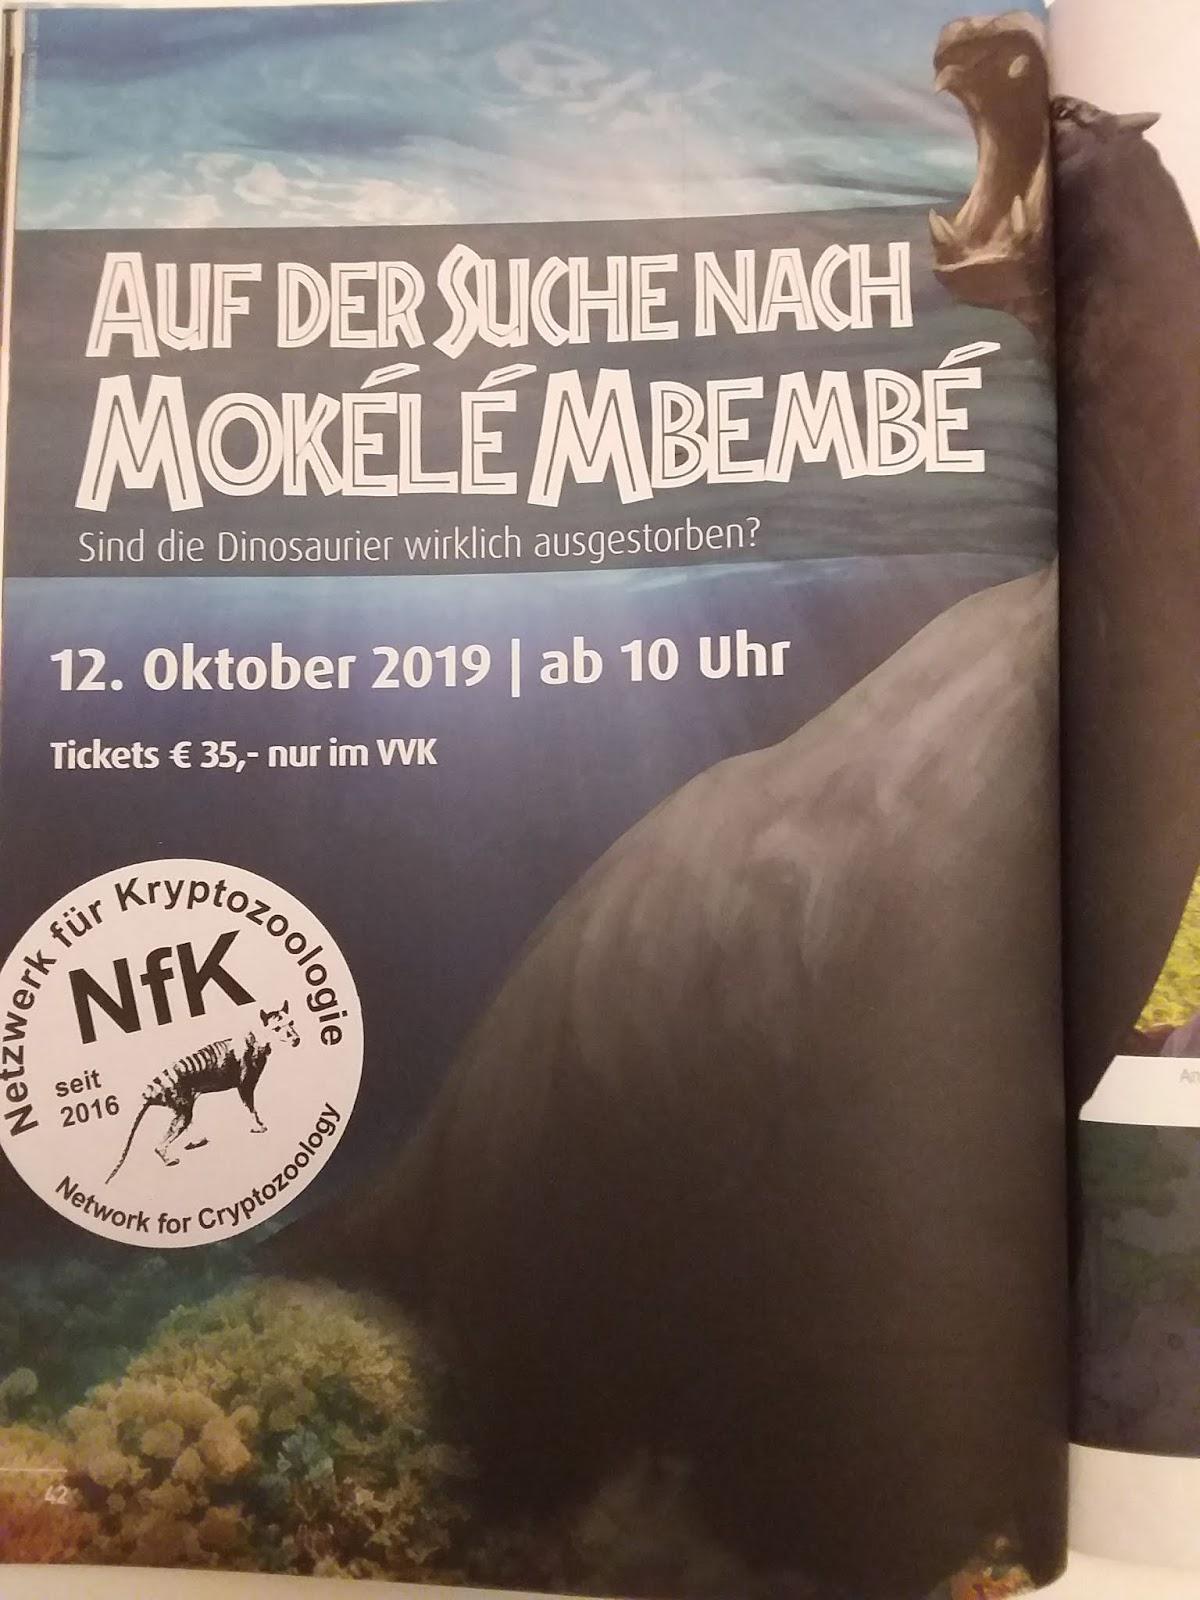 MOKELE - MBEMBE EXPEDITIONS